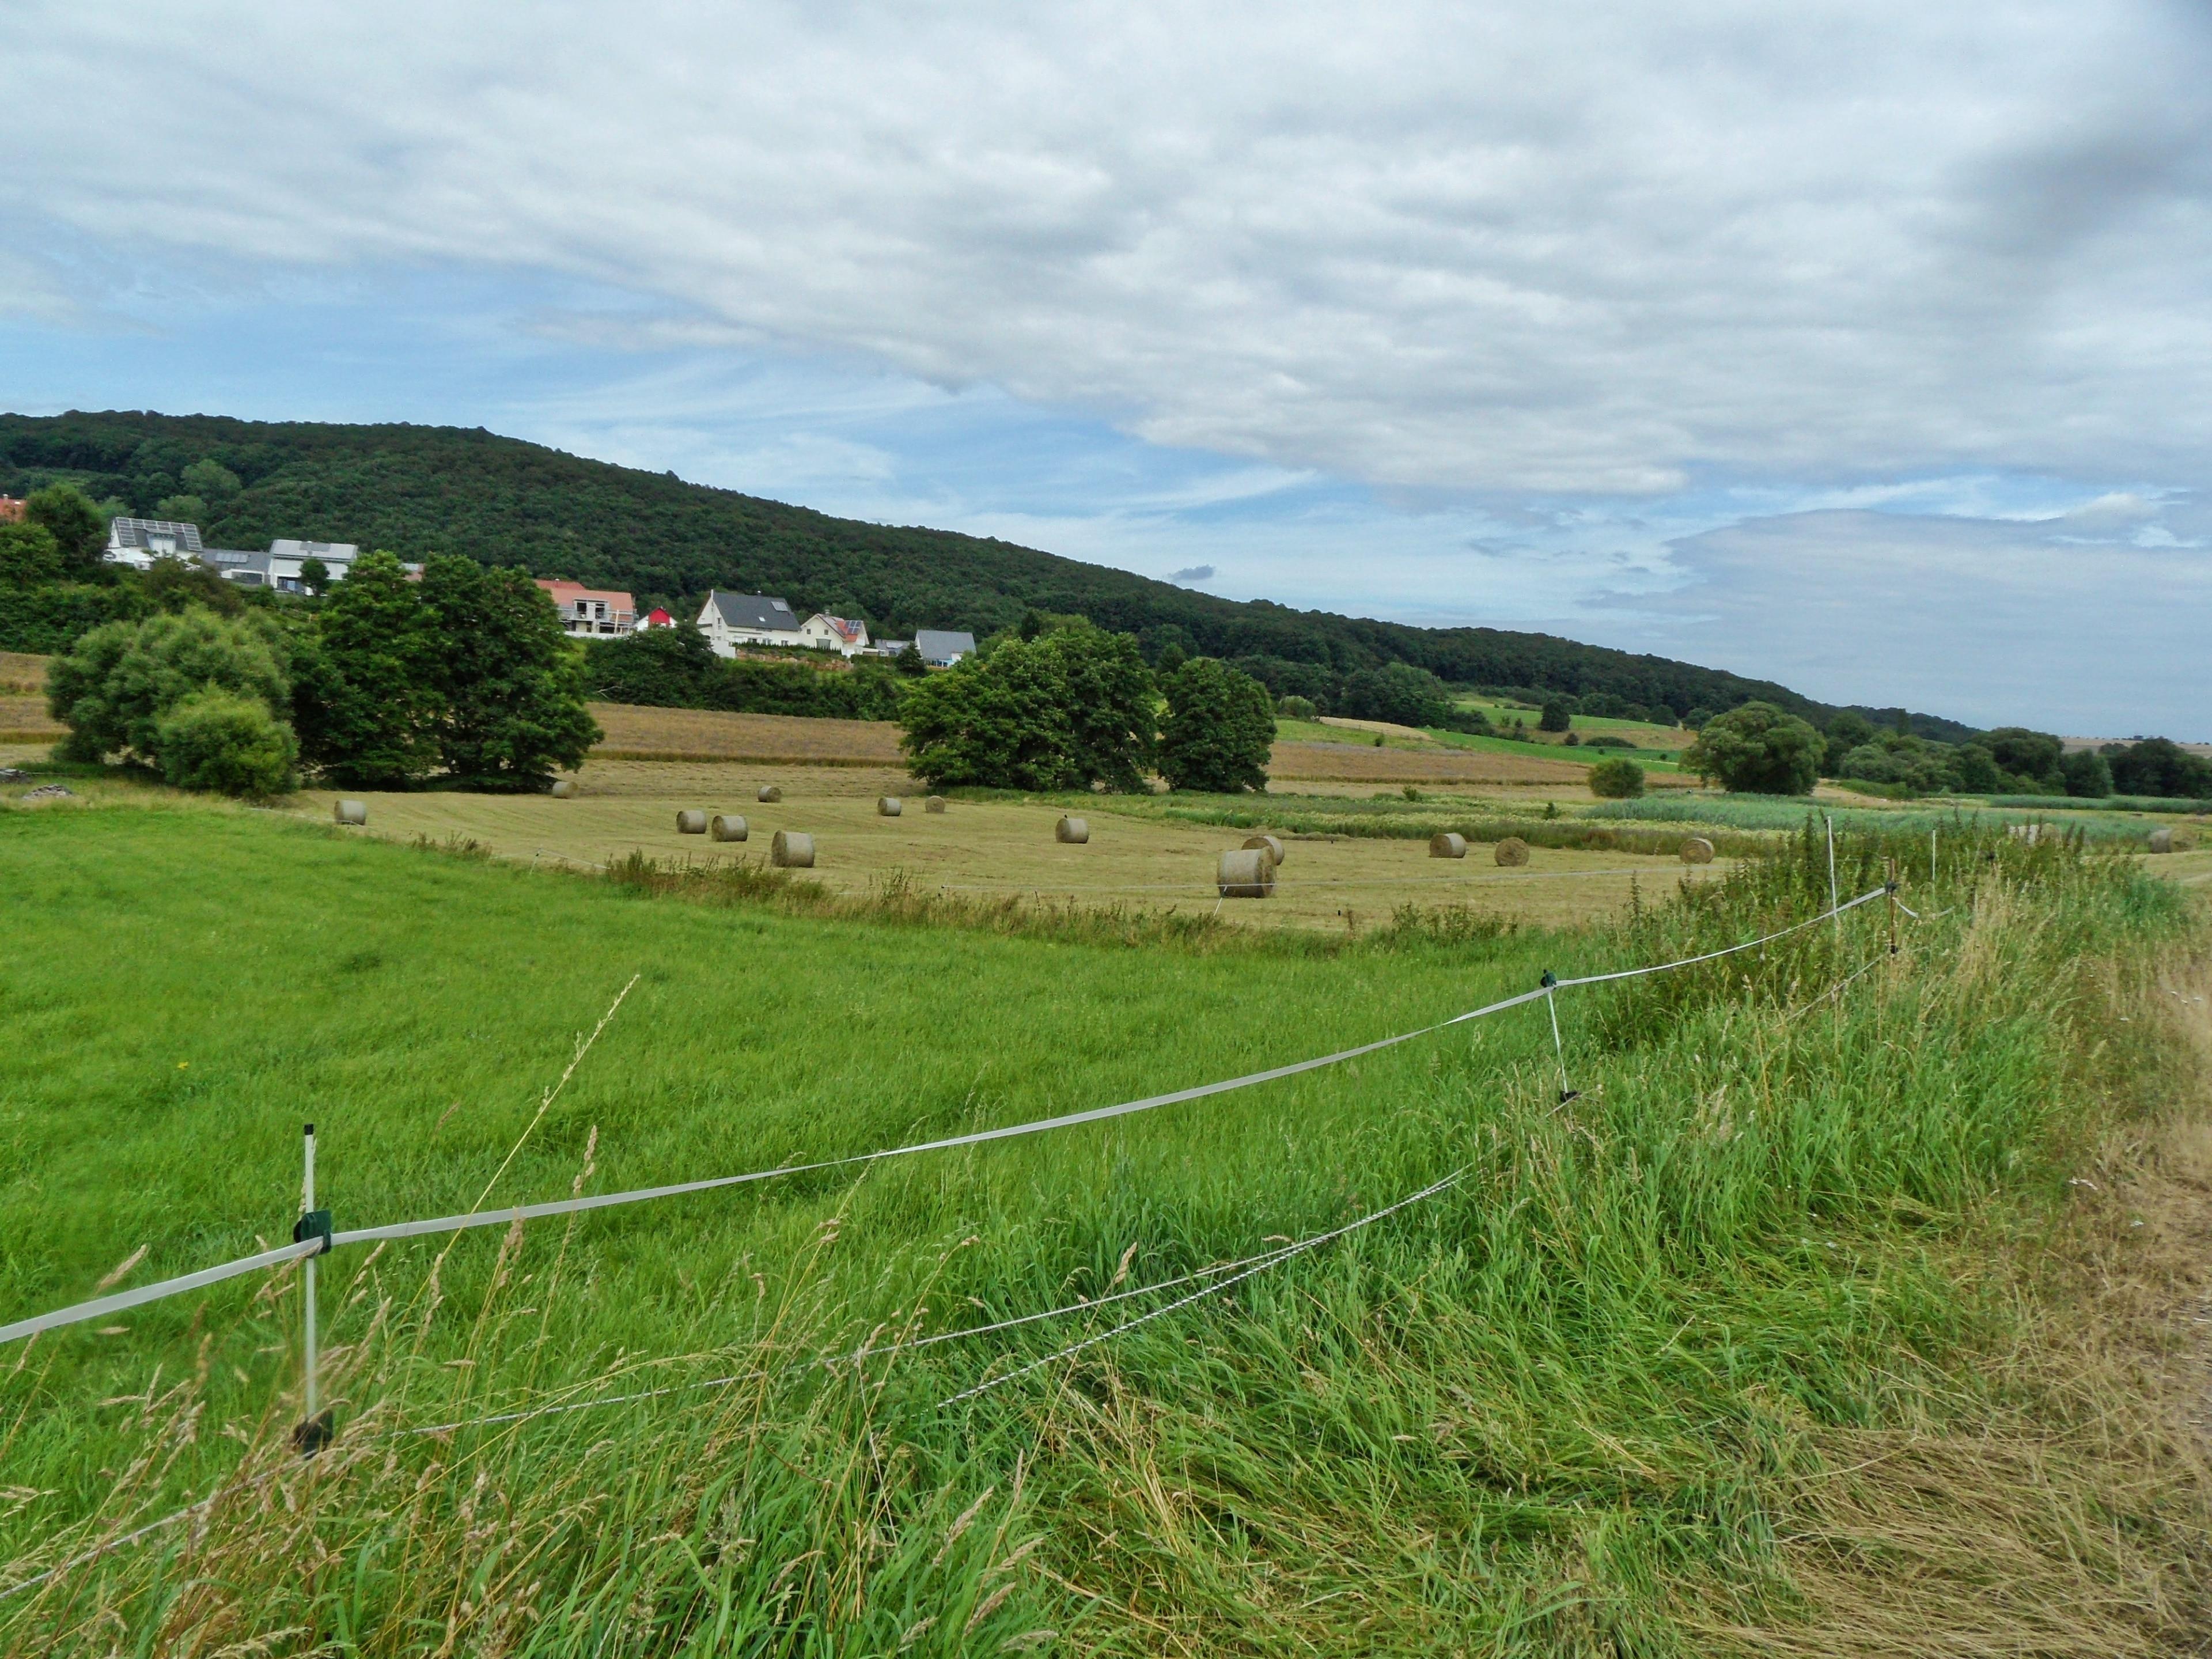 Weilerbach, Rhineland-Palatinate, Germany